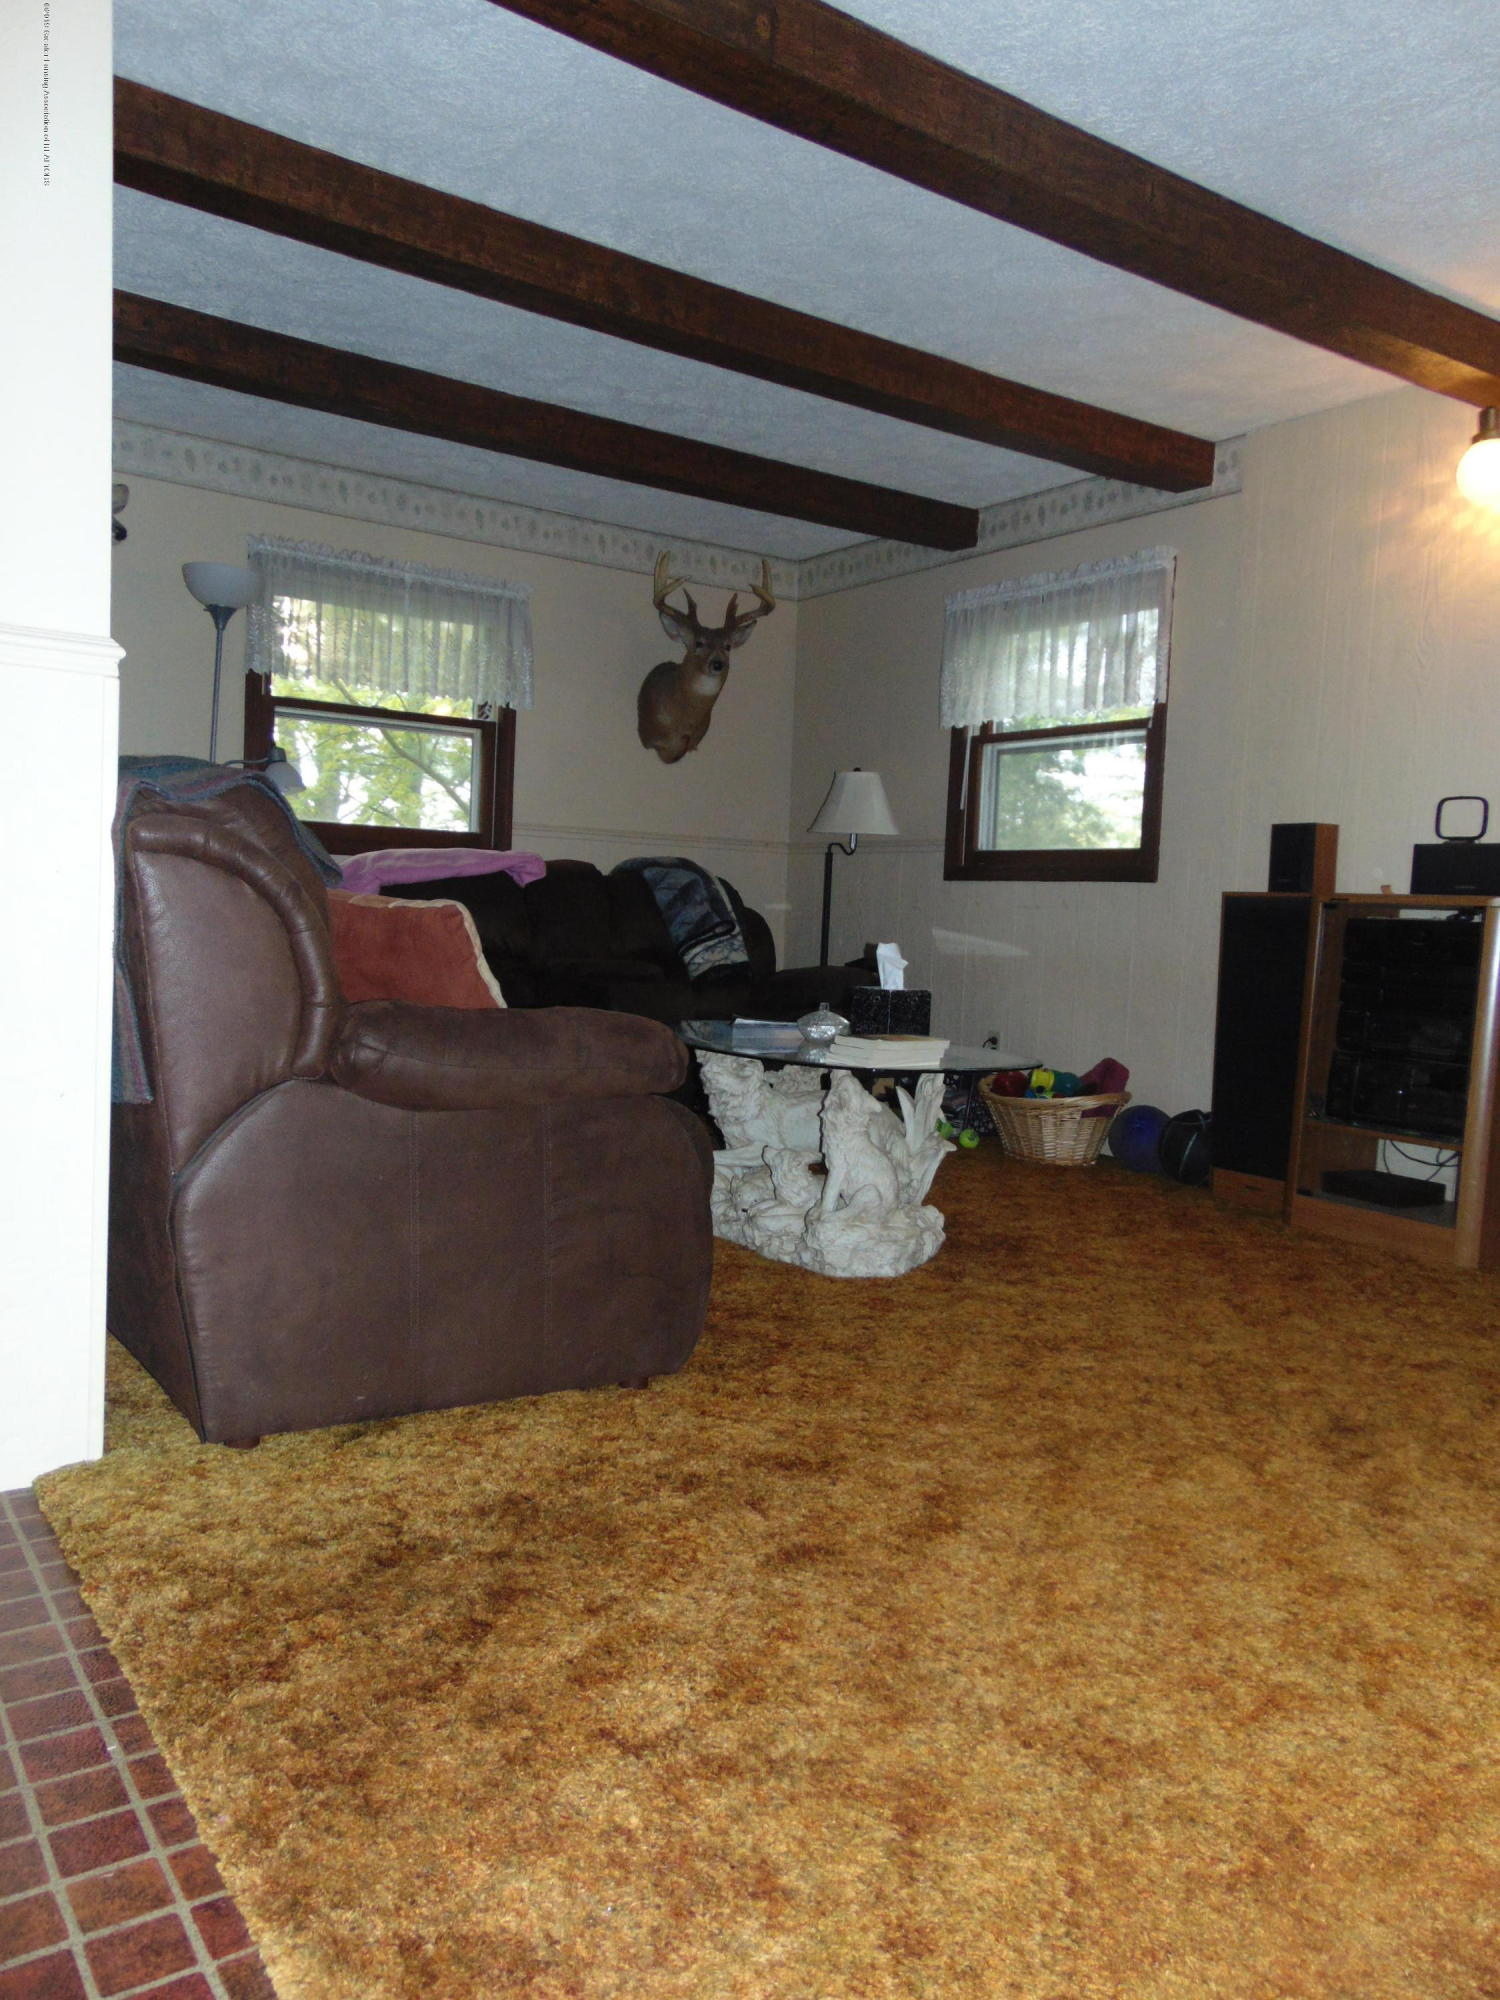 275 S Chester Rd - living room - 18